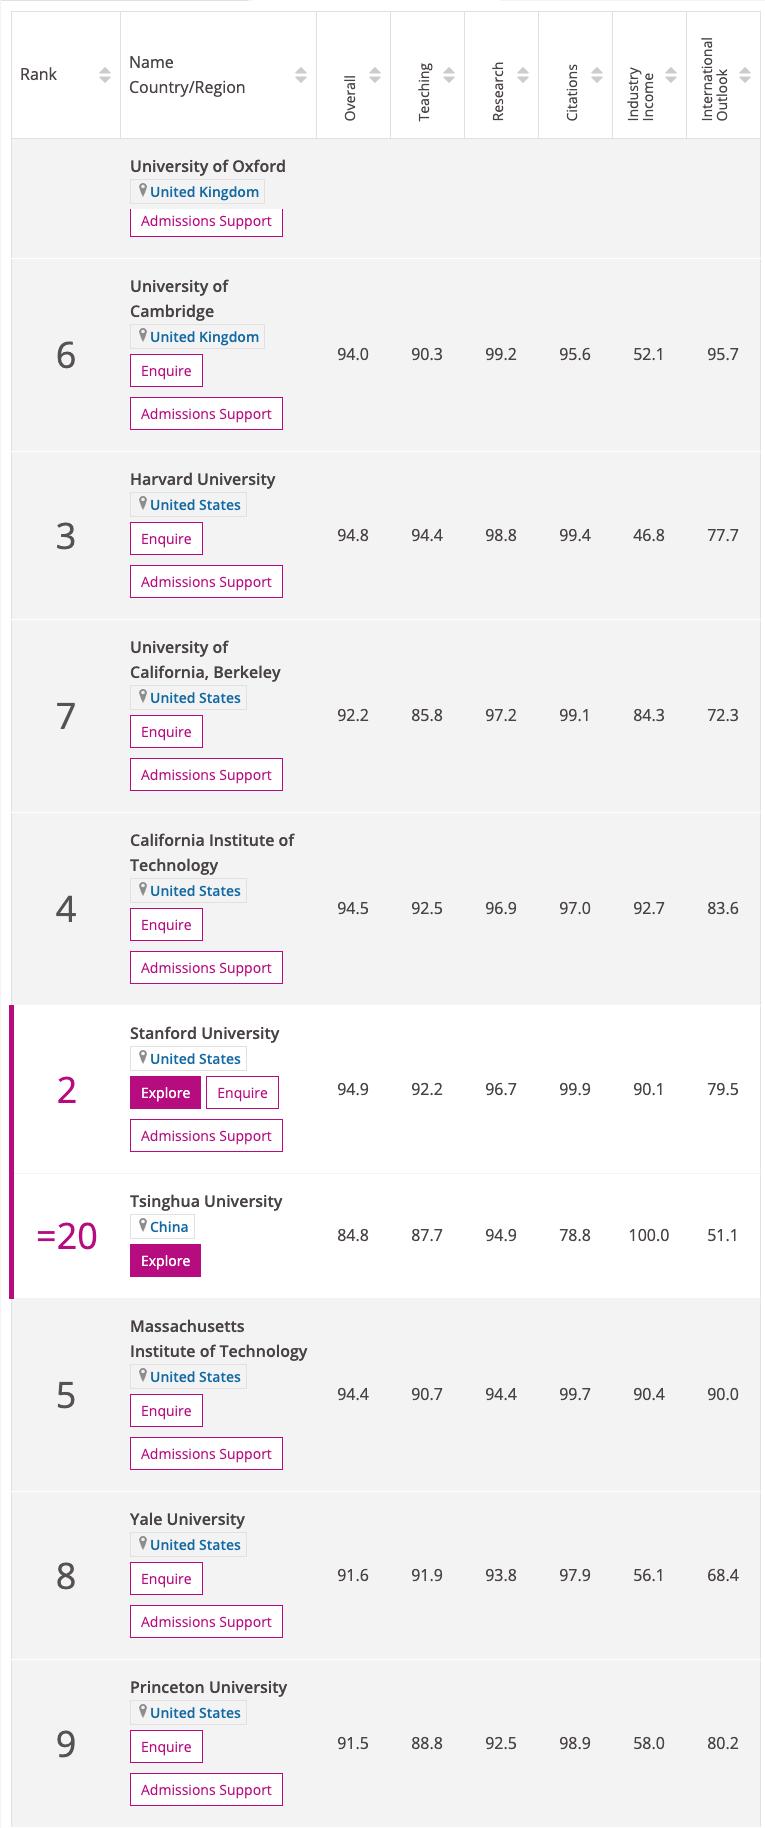 Source: World University Rankings 2021. Times Higher Education.